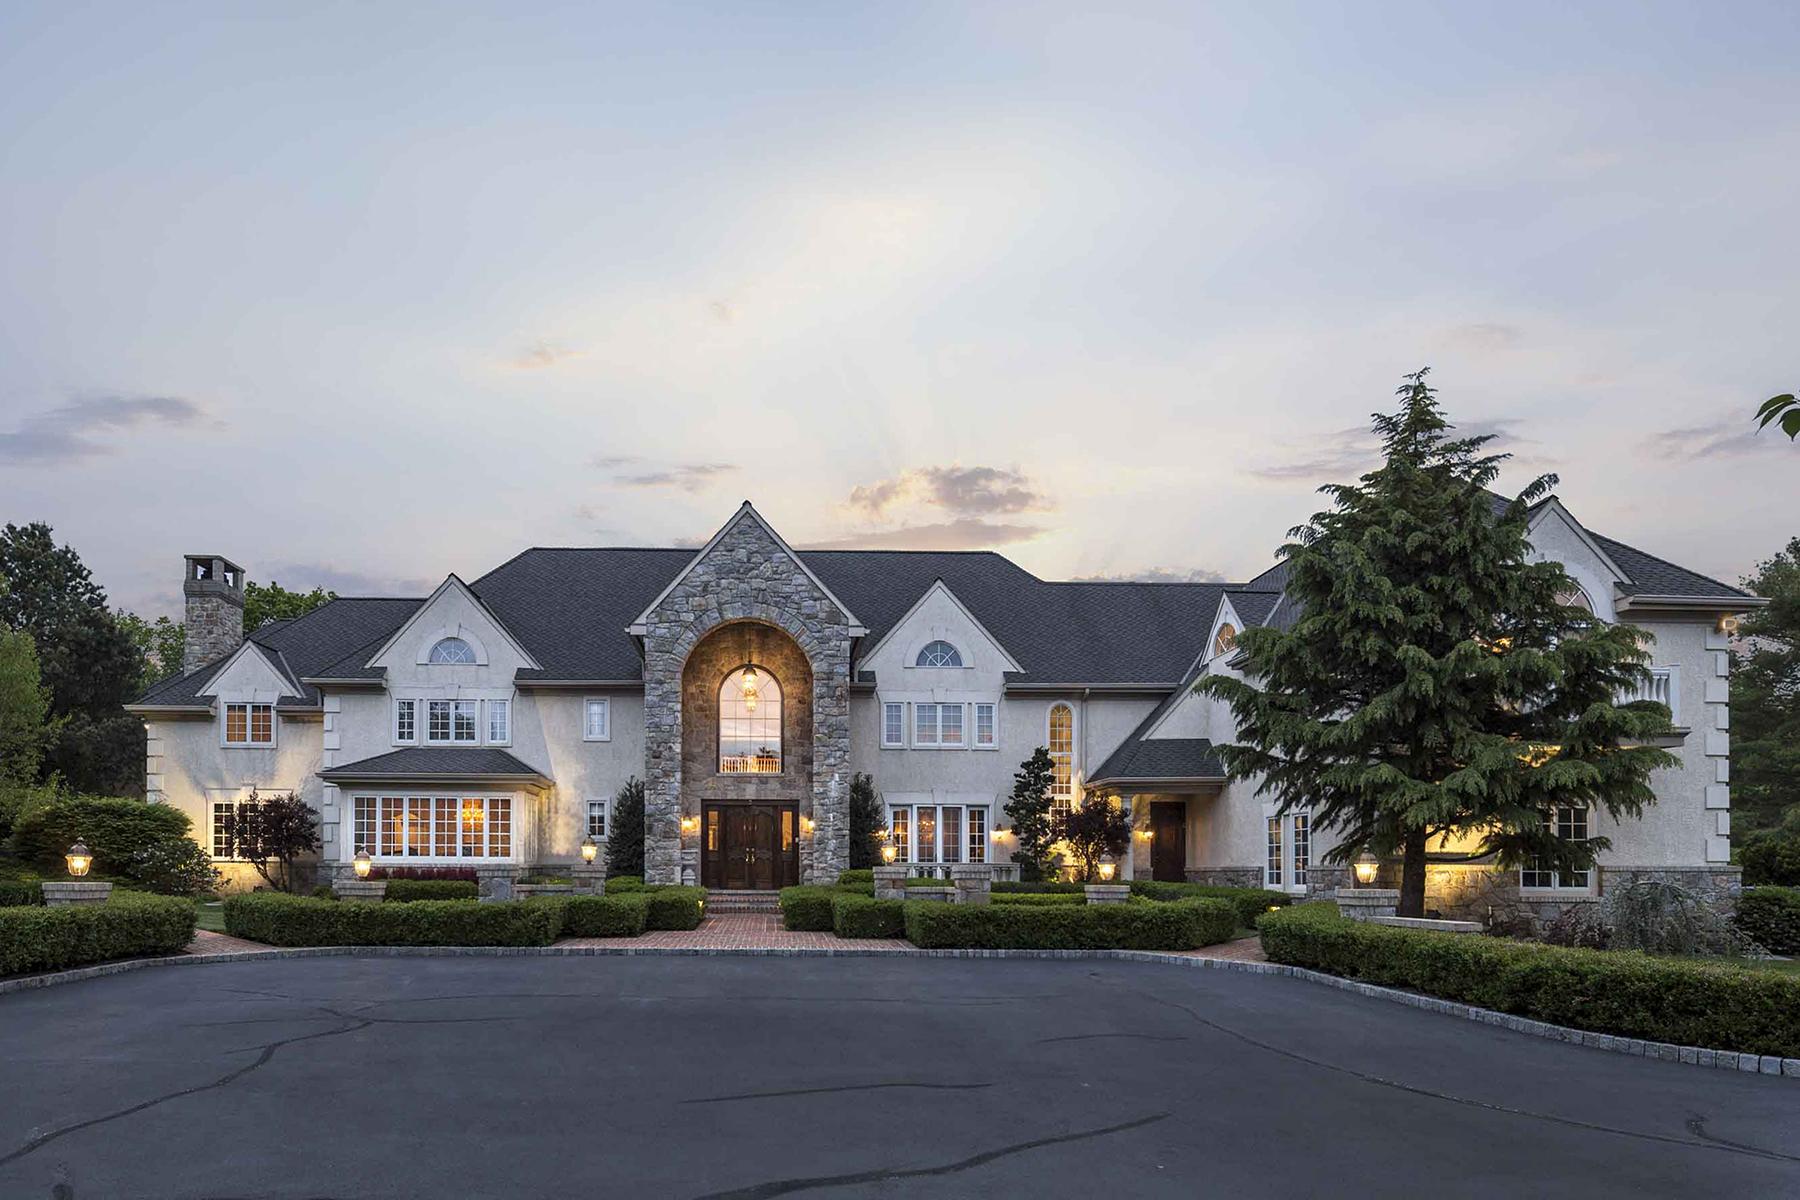 Villa per Vendita alle ore Gwynedd Valleys Finest 303 Cathcart Rd Gwynedd Valley, Pensilvania, 19047 Stati Uniti